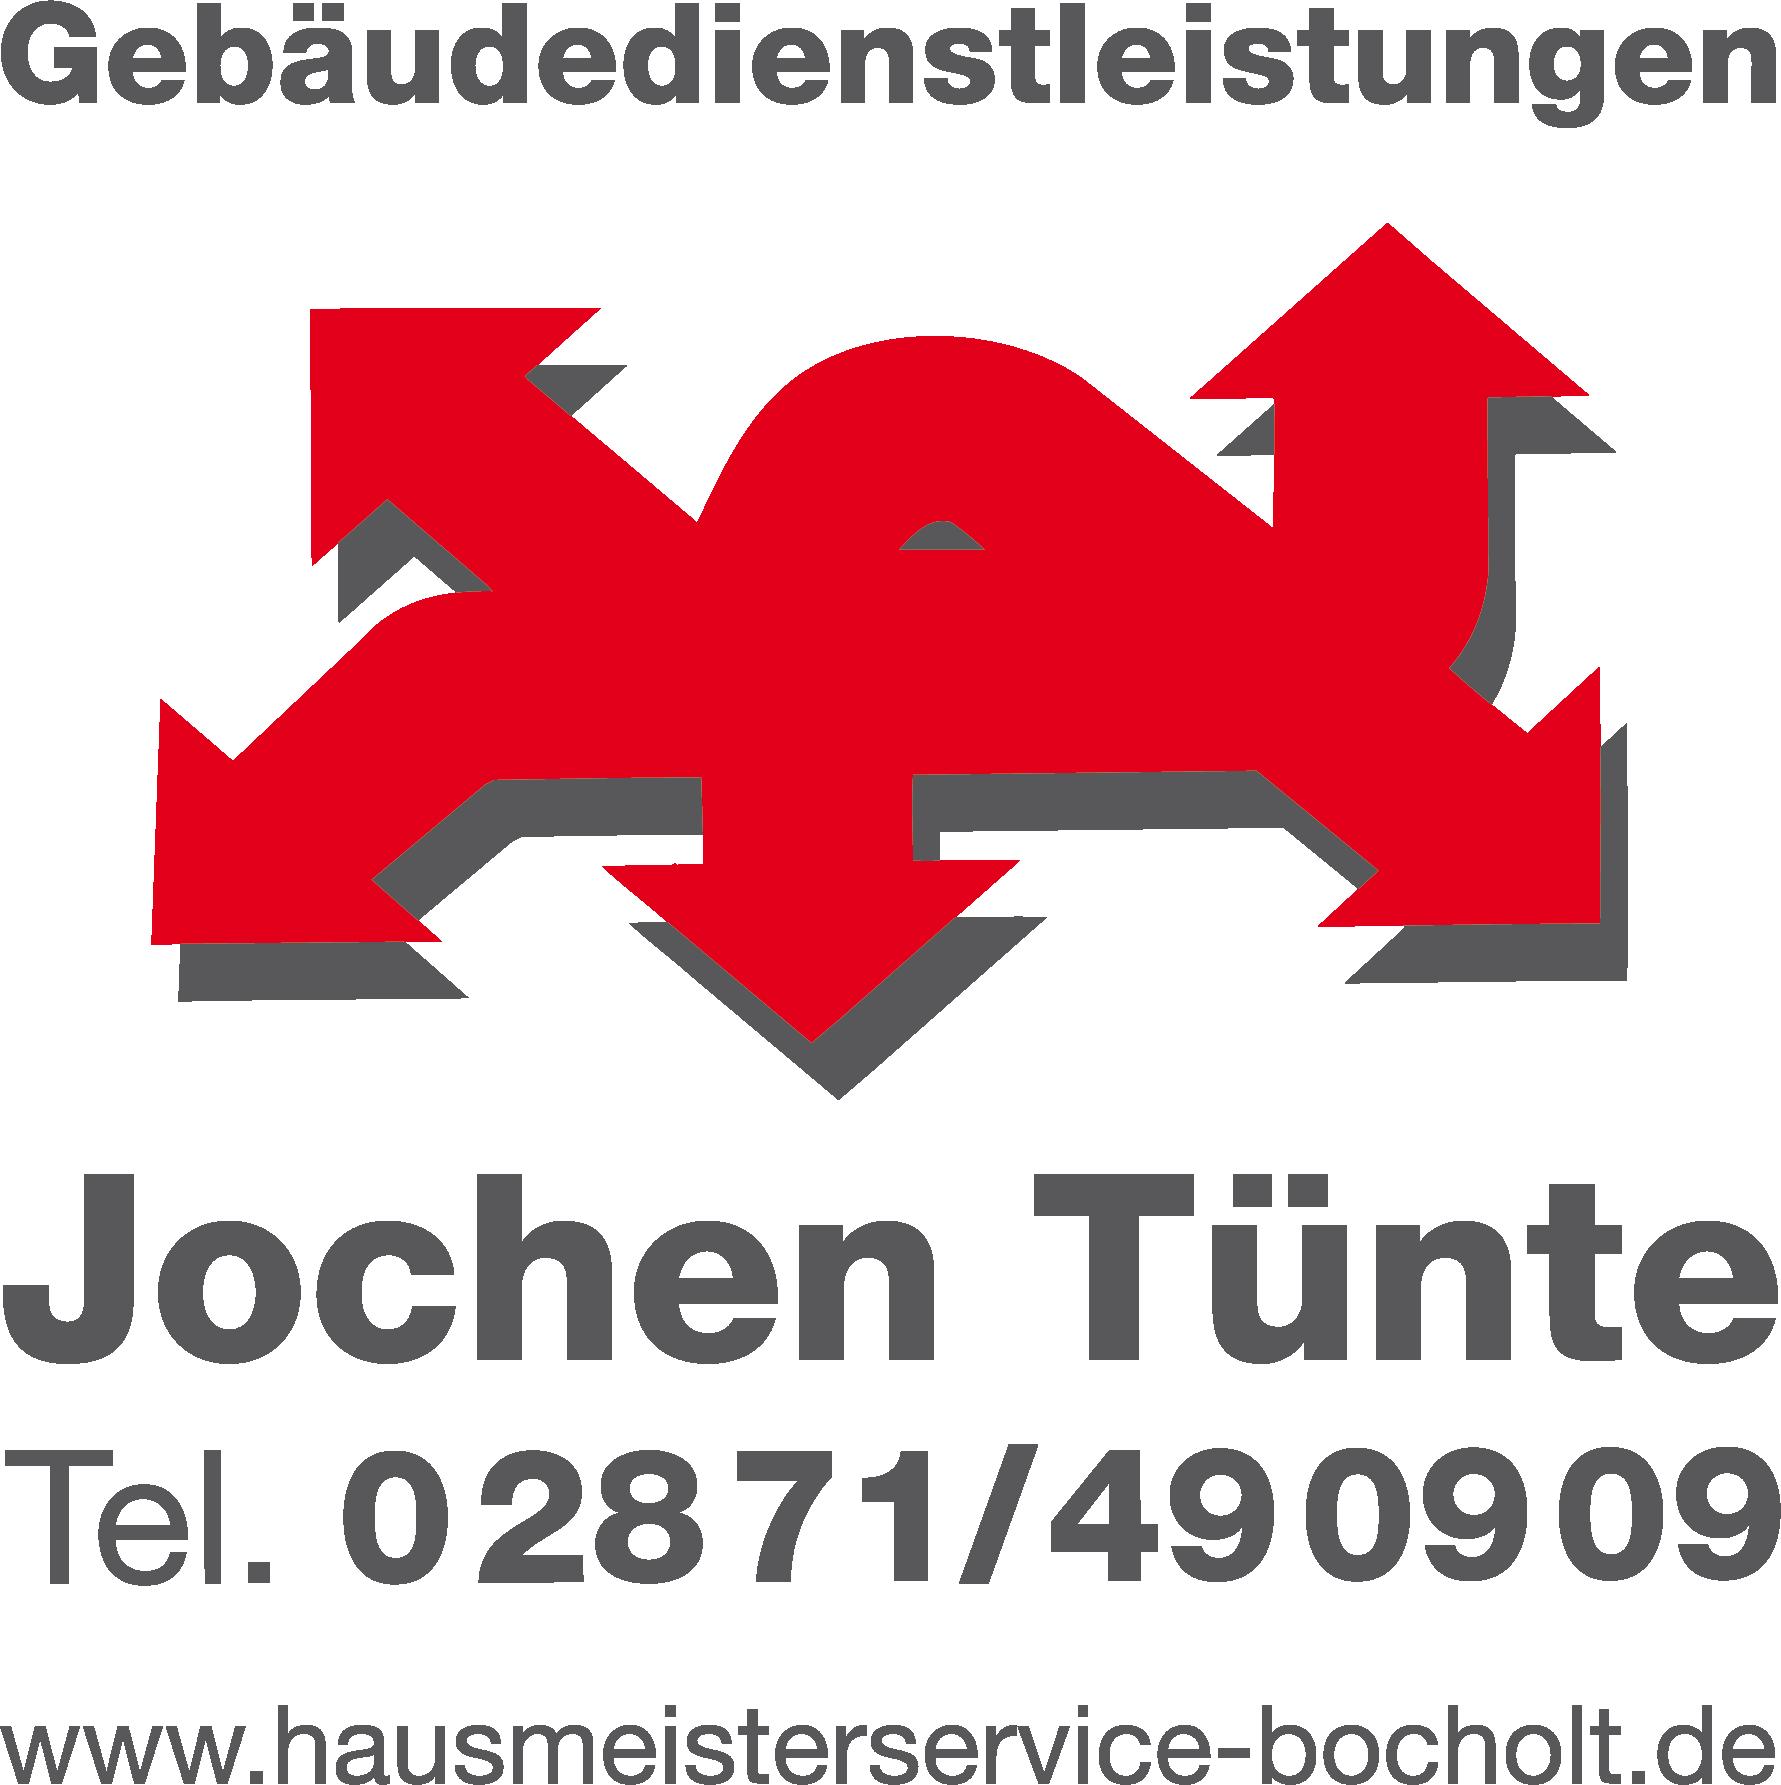 Jochen Tünte